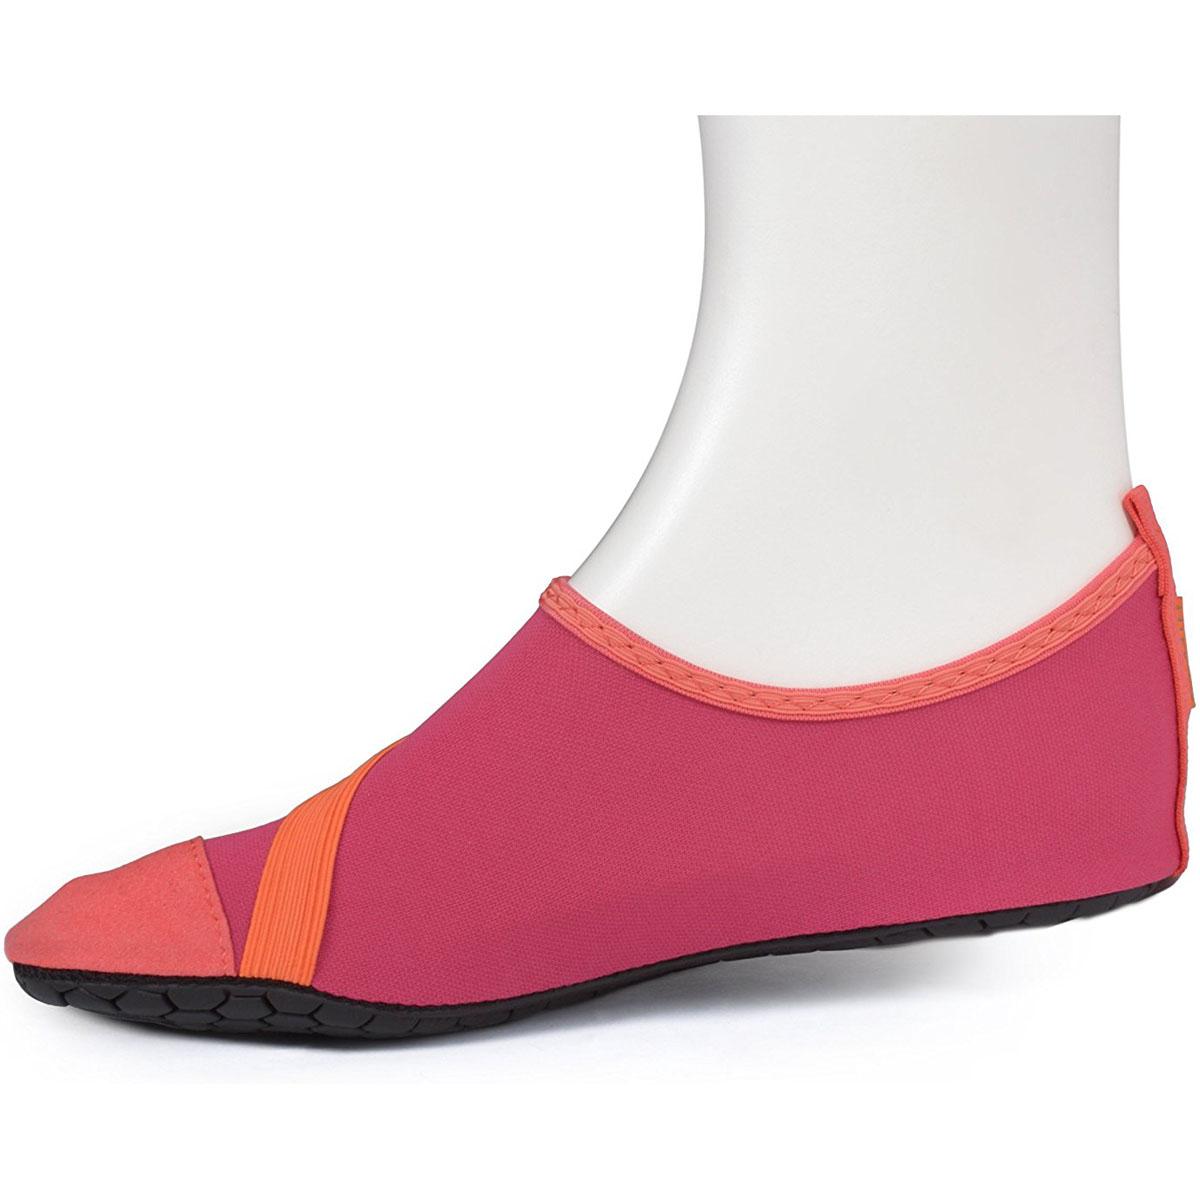 FitKicks-Women-039-s-Non-Slip-Sole-Active-Footwear thumbnail 17